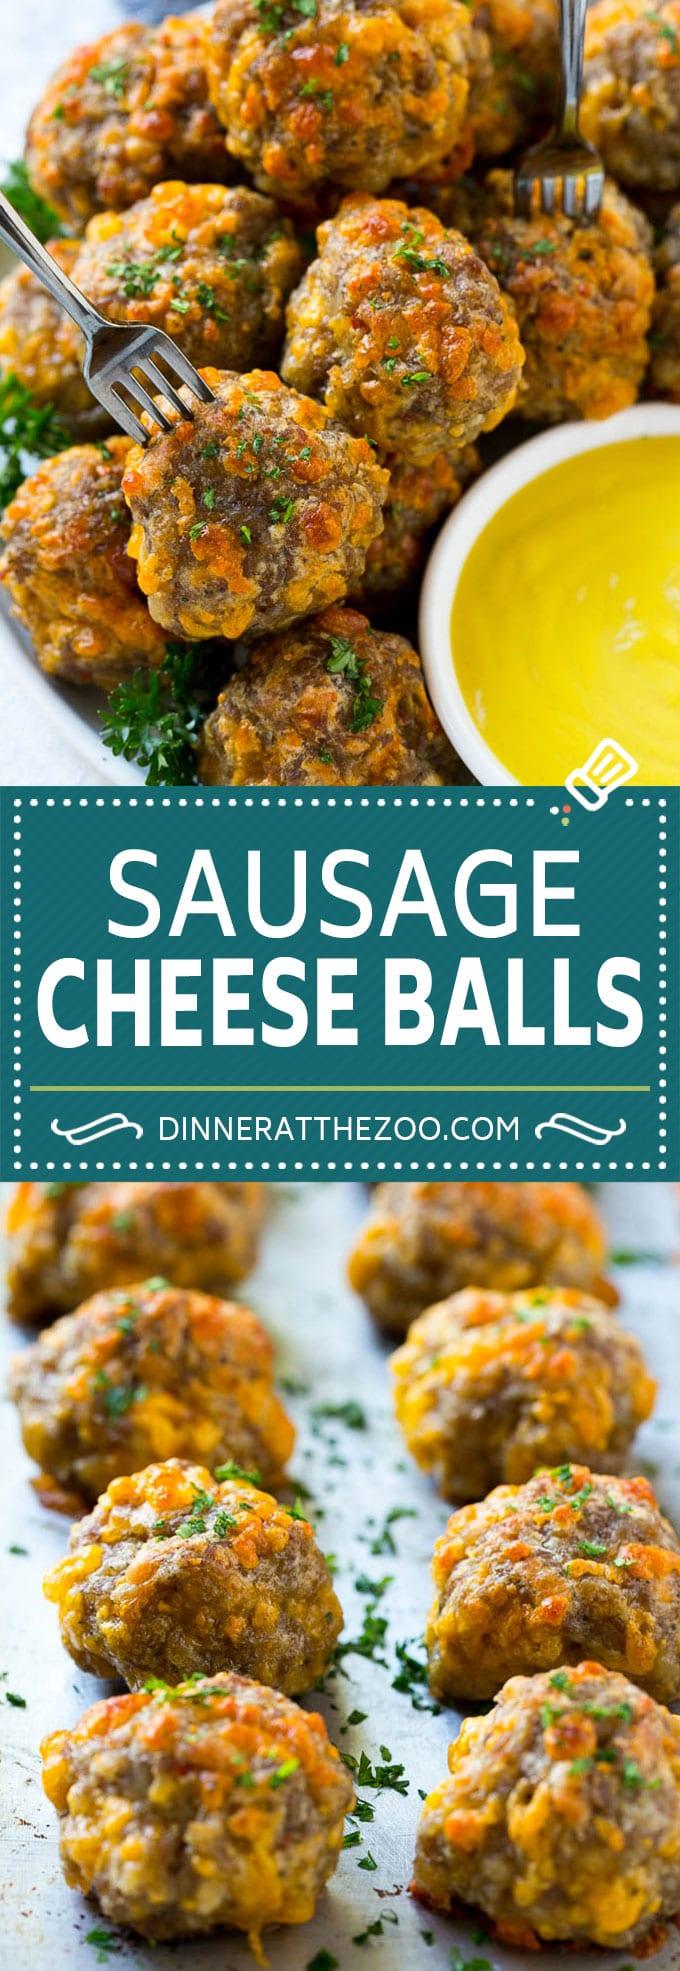 Sausage Cheese Balls Recipe | Sausage Balls Recipe | Bisquick Sausage Balls #sausage #cheese #appetizer #dinneratthezoo